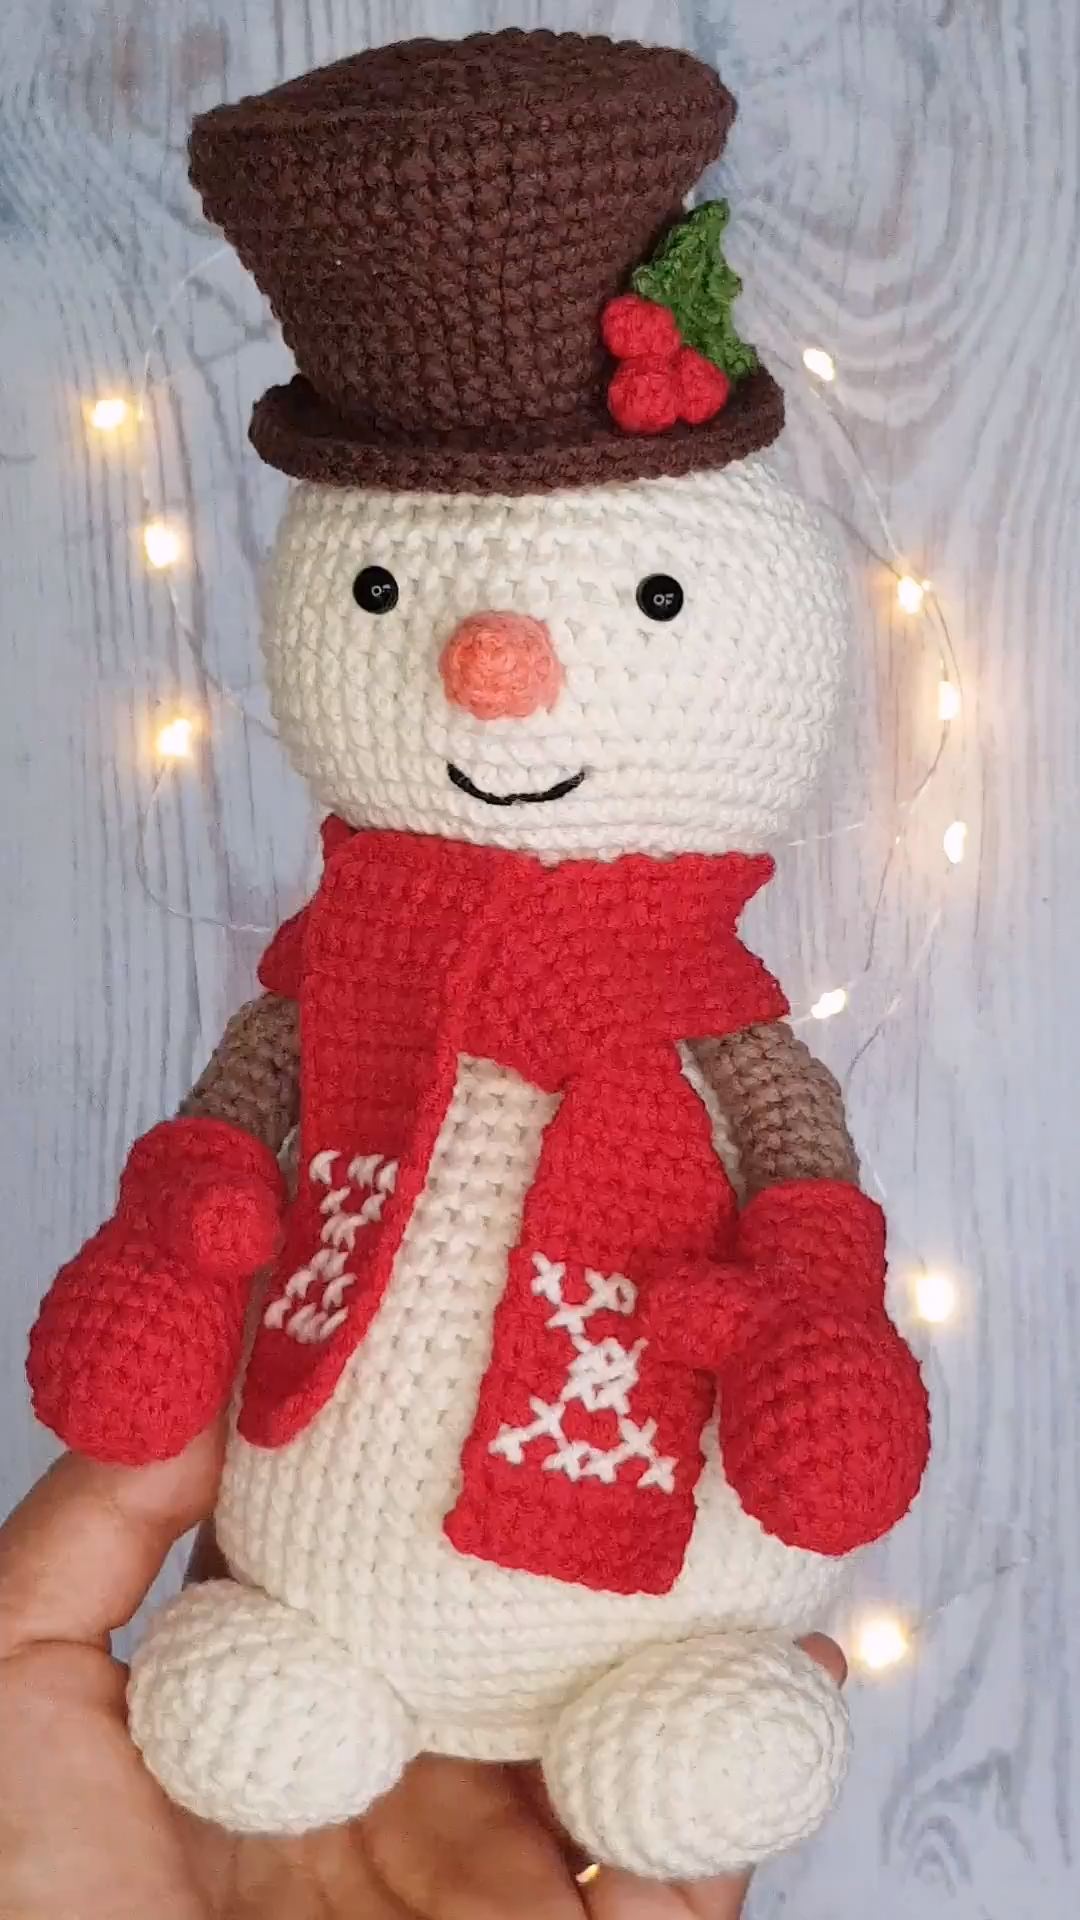 CHRISTMAS CROCHET COLLECTION Snowman crochet pattern  Santa crochet pattern Coaster crochet pattern Reindeer crochet pattern  Crown pattern